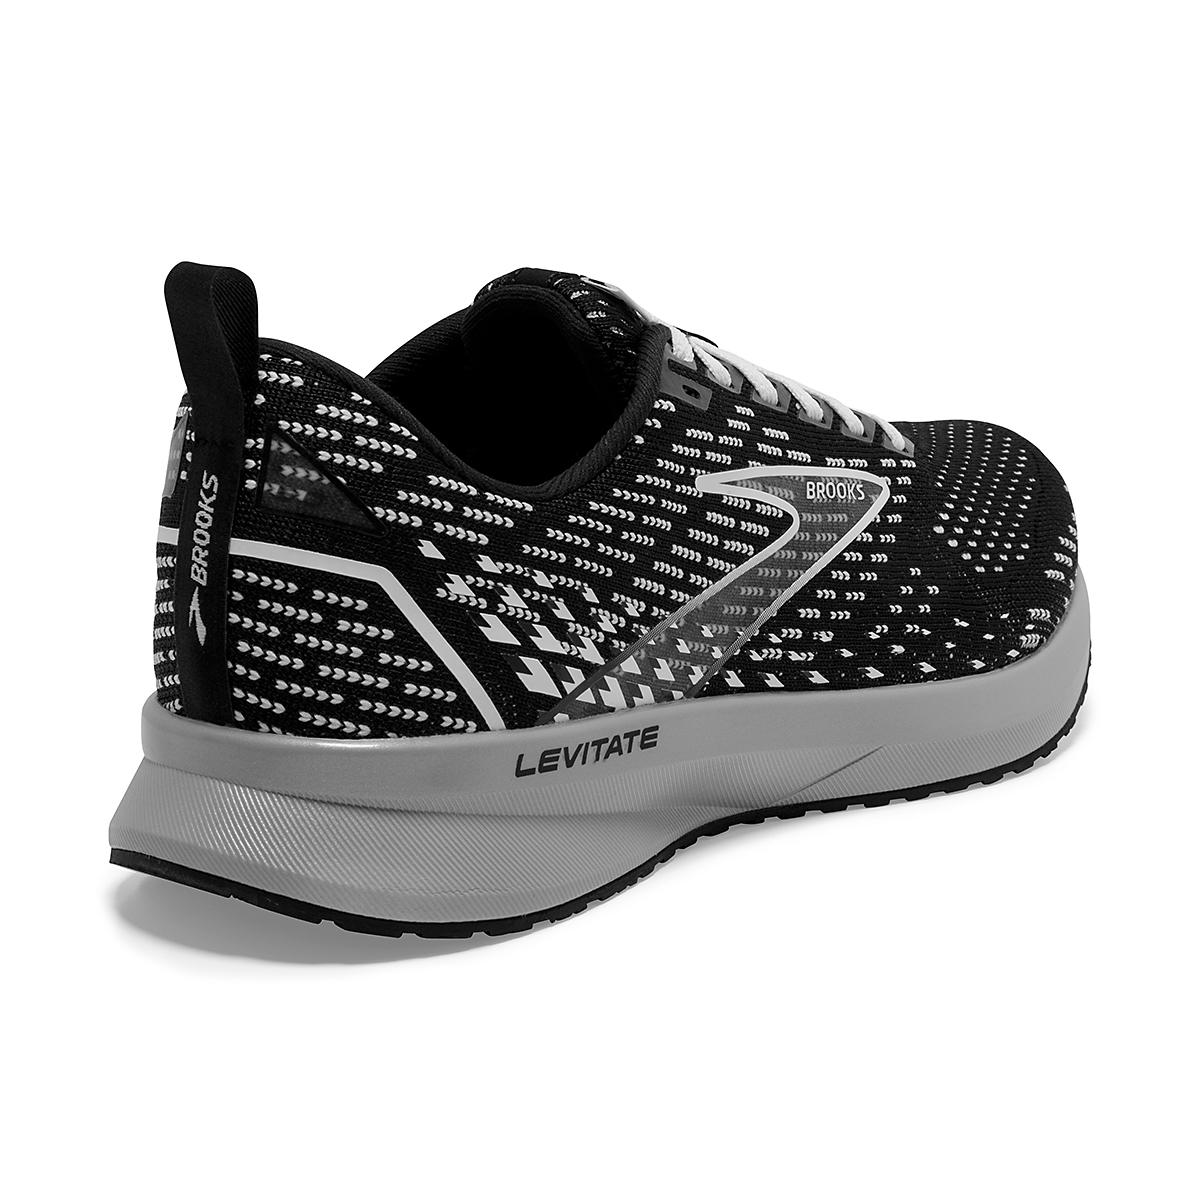 Women's Brooks Levitate 5 Running Shoe - Color: Black/Grey/White - Size: 5 - Width: Regular, Black/Grey/White, large, image 3